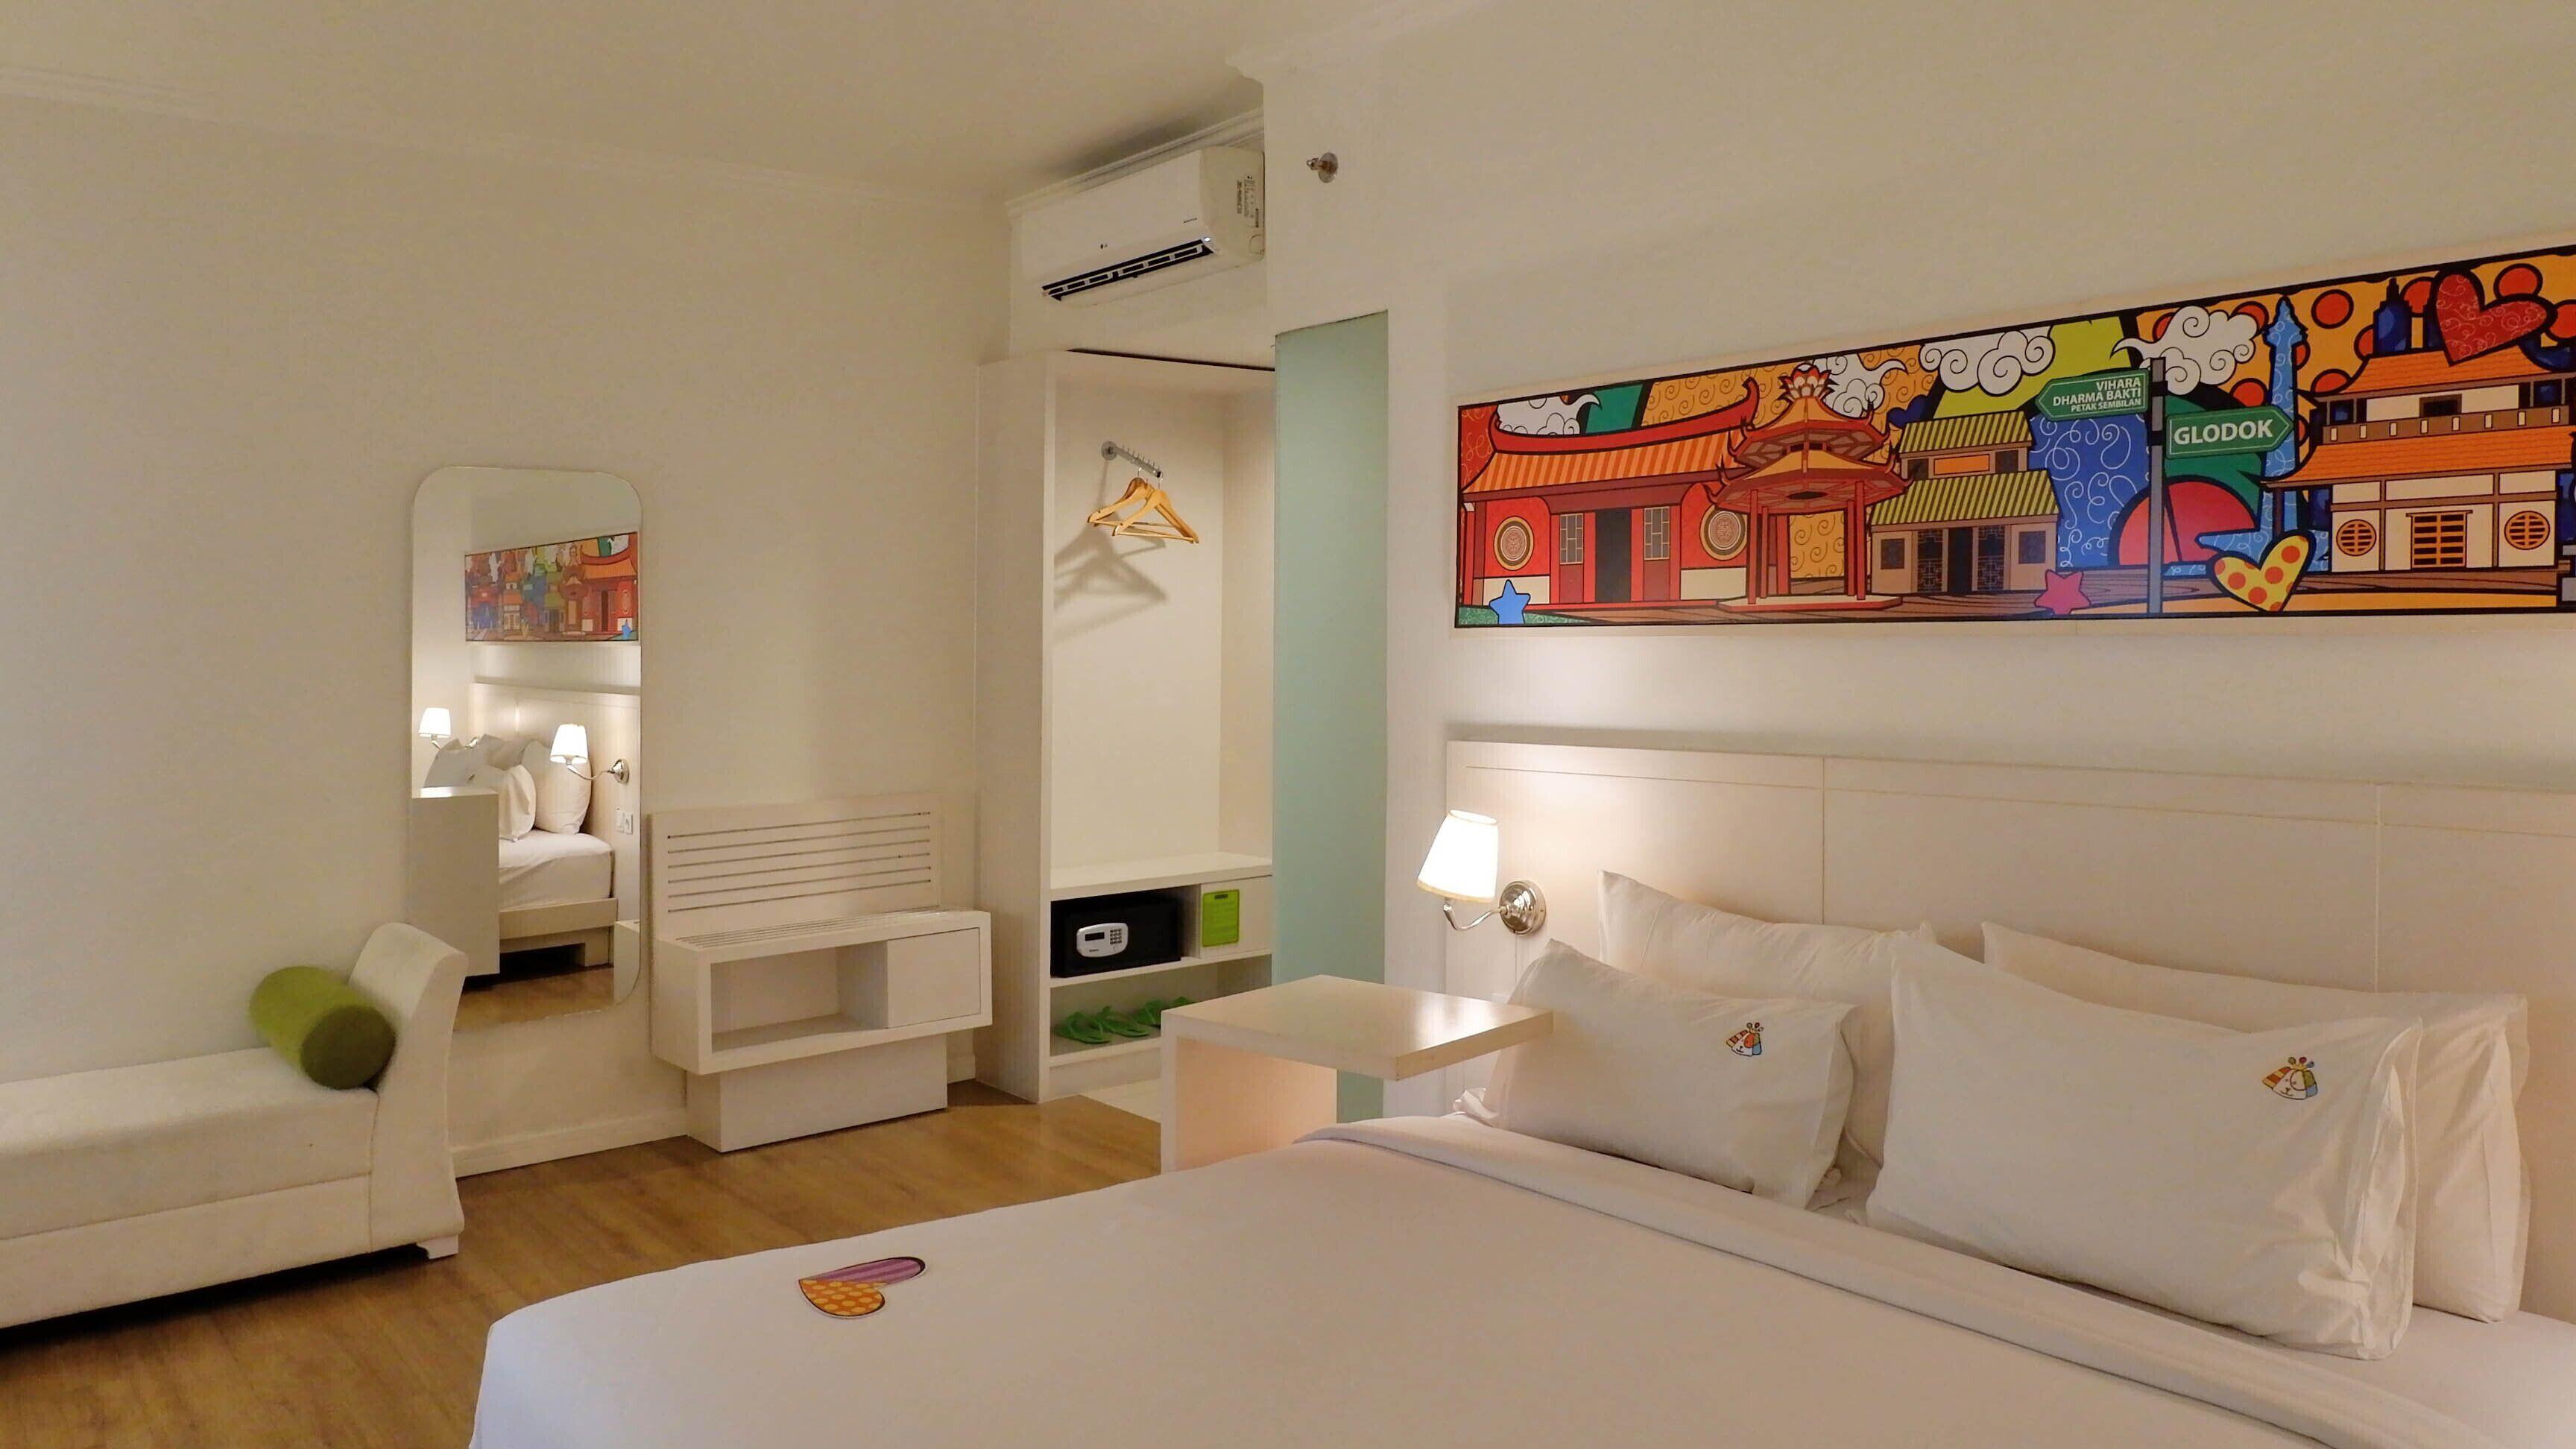 Maxonehotels.com At Glodok